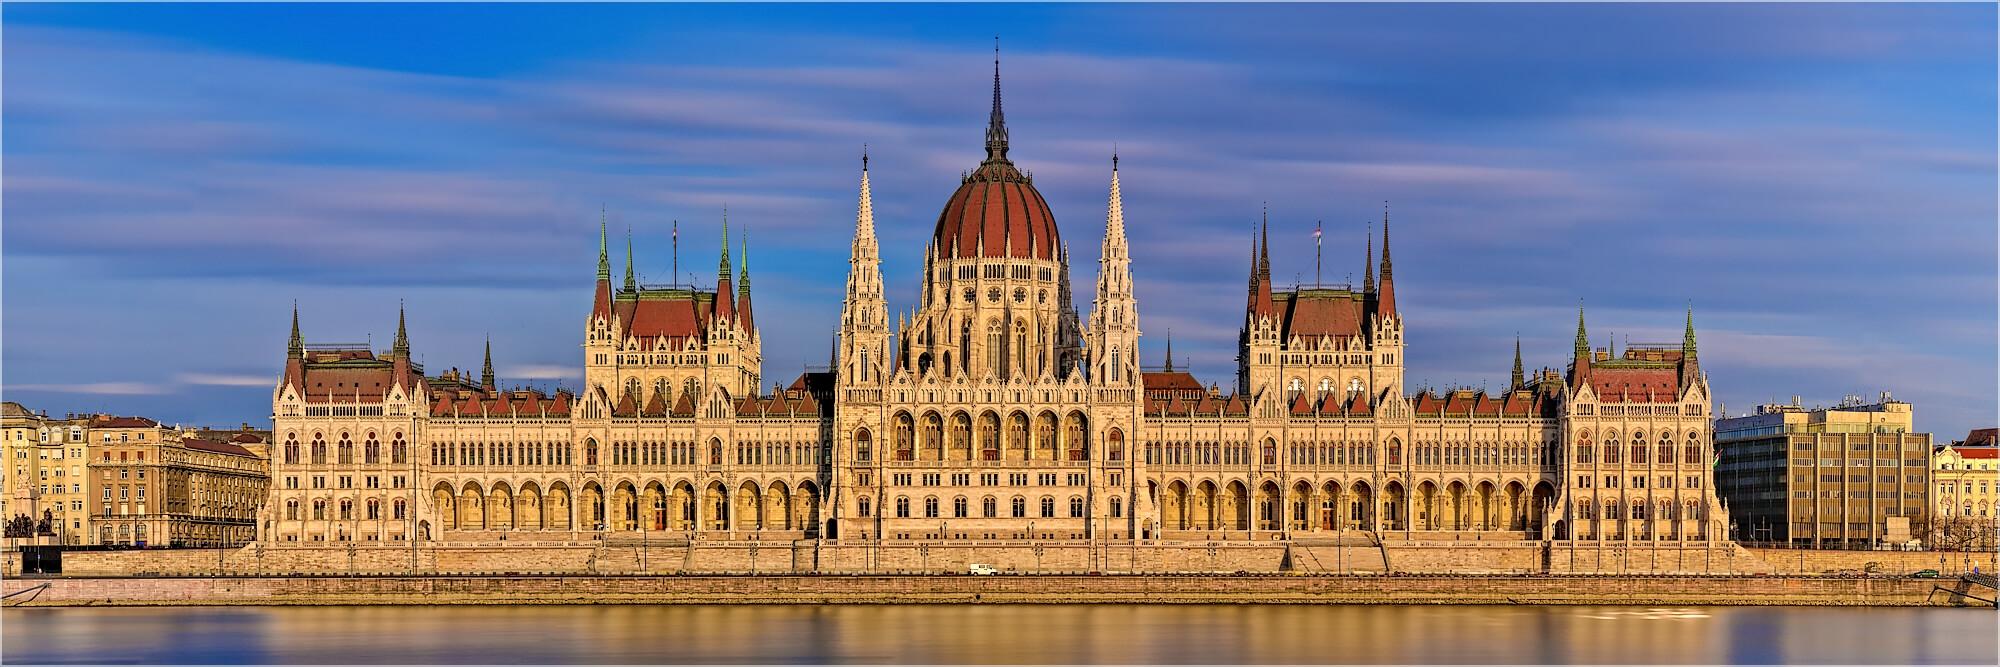 Panoramabild Parlament von Budapest Ungarn